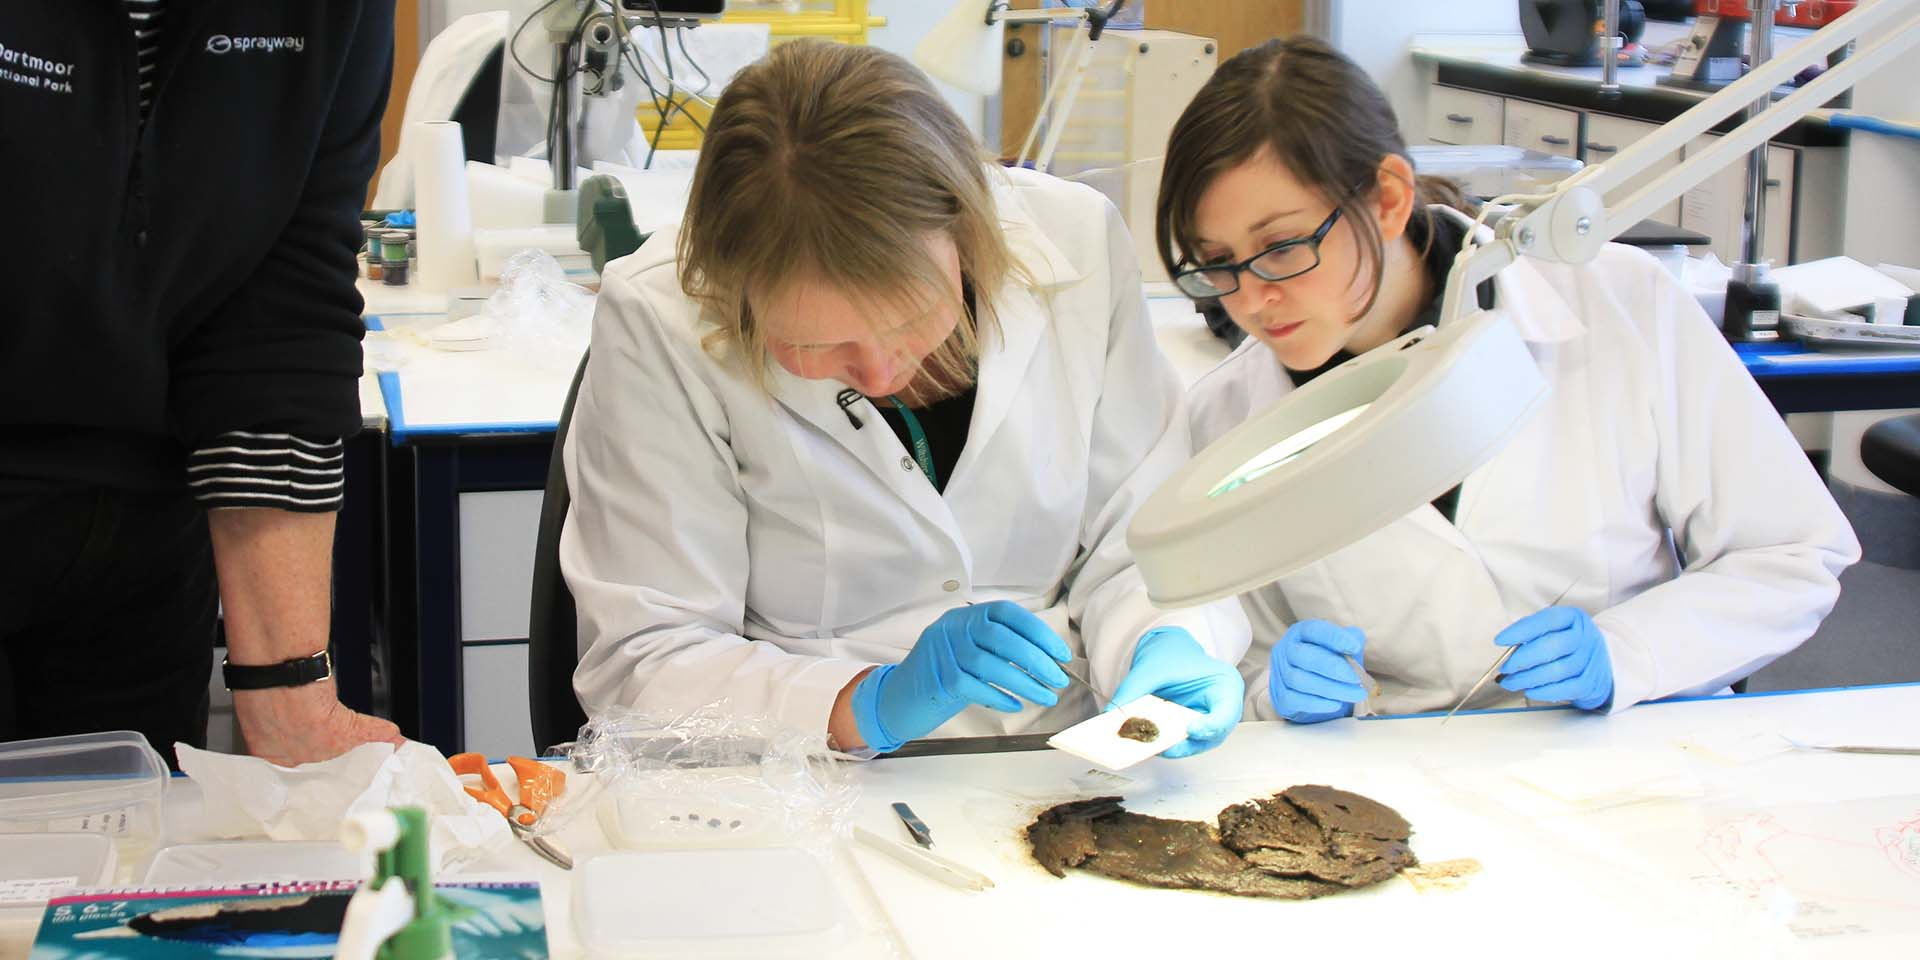 Scientists in laboratory examining artefact